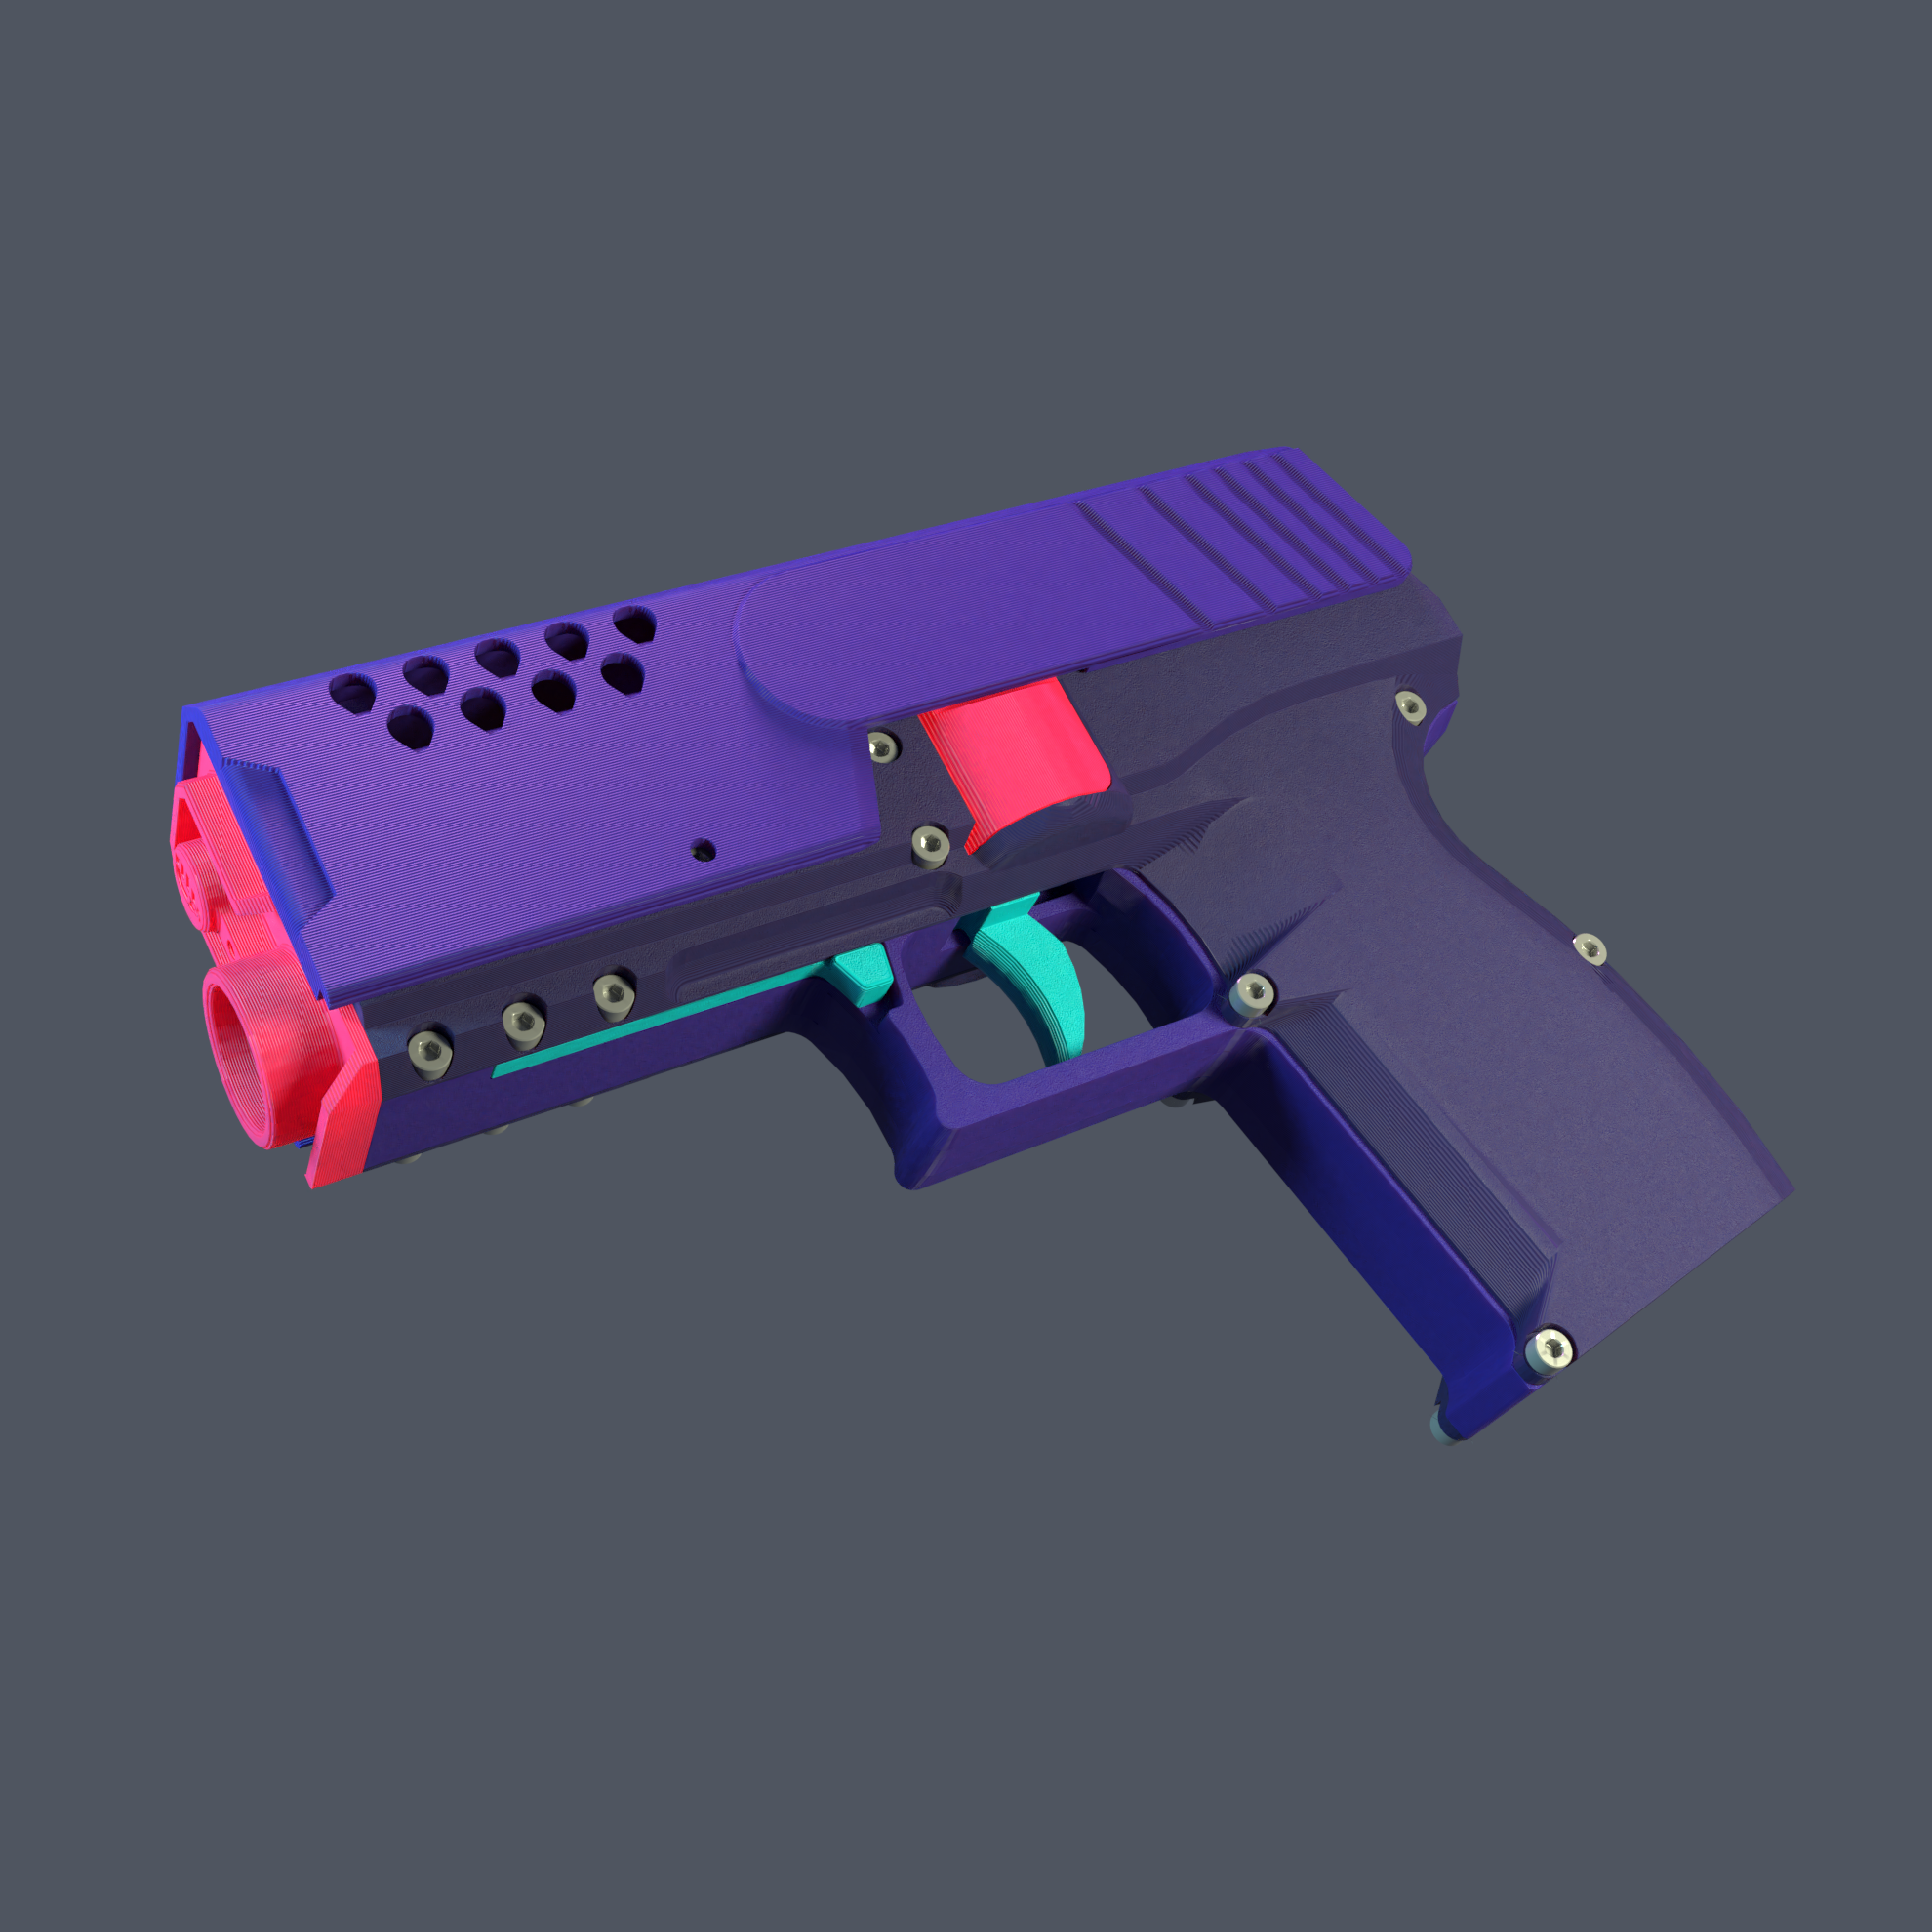 The future of the Concept Pistol